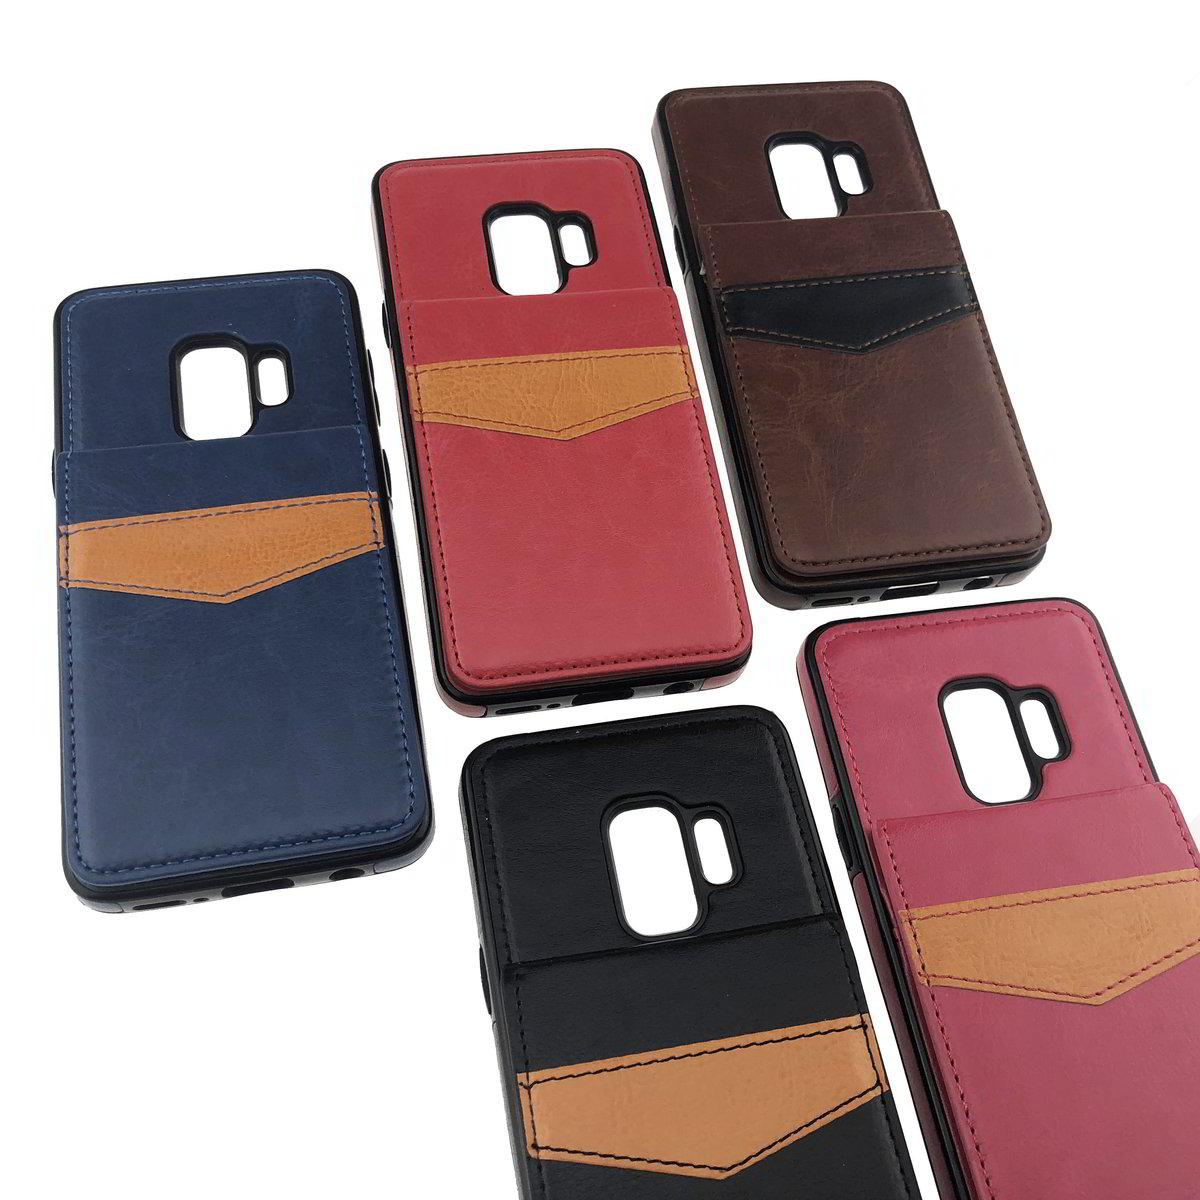 Ikase Vertical Leather Flip Wallet Case Goospery Iphone X Hybrid Dream Bumper Red